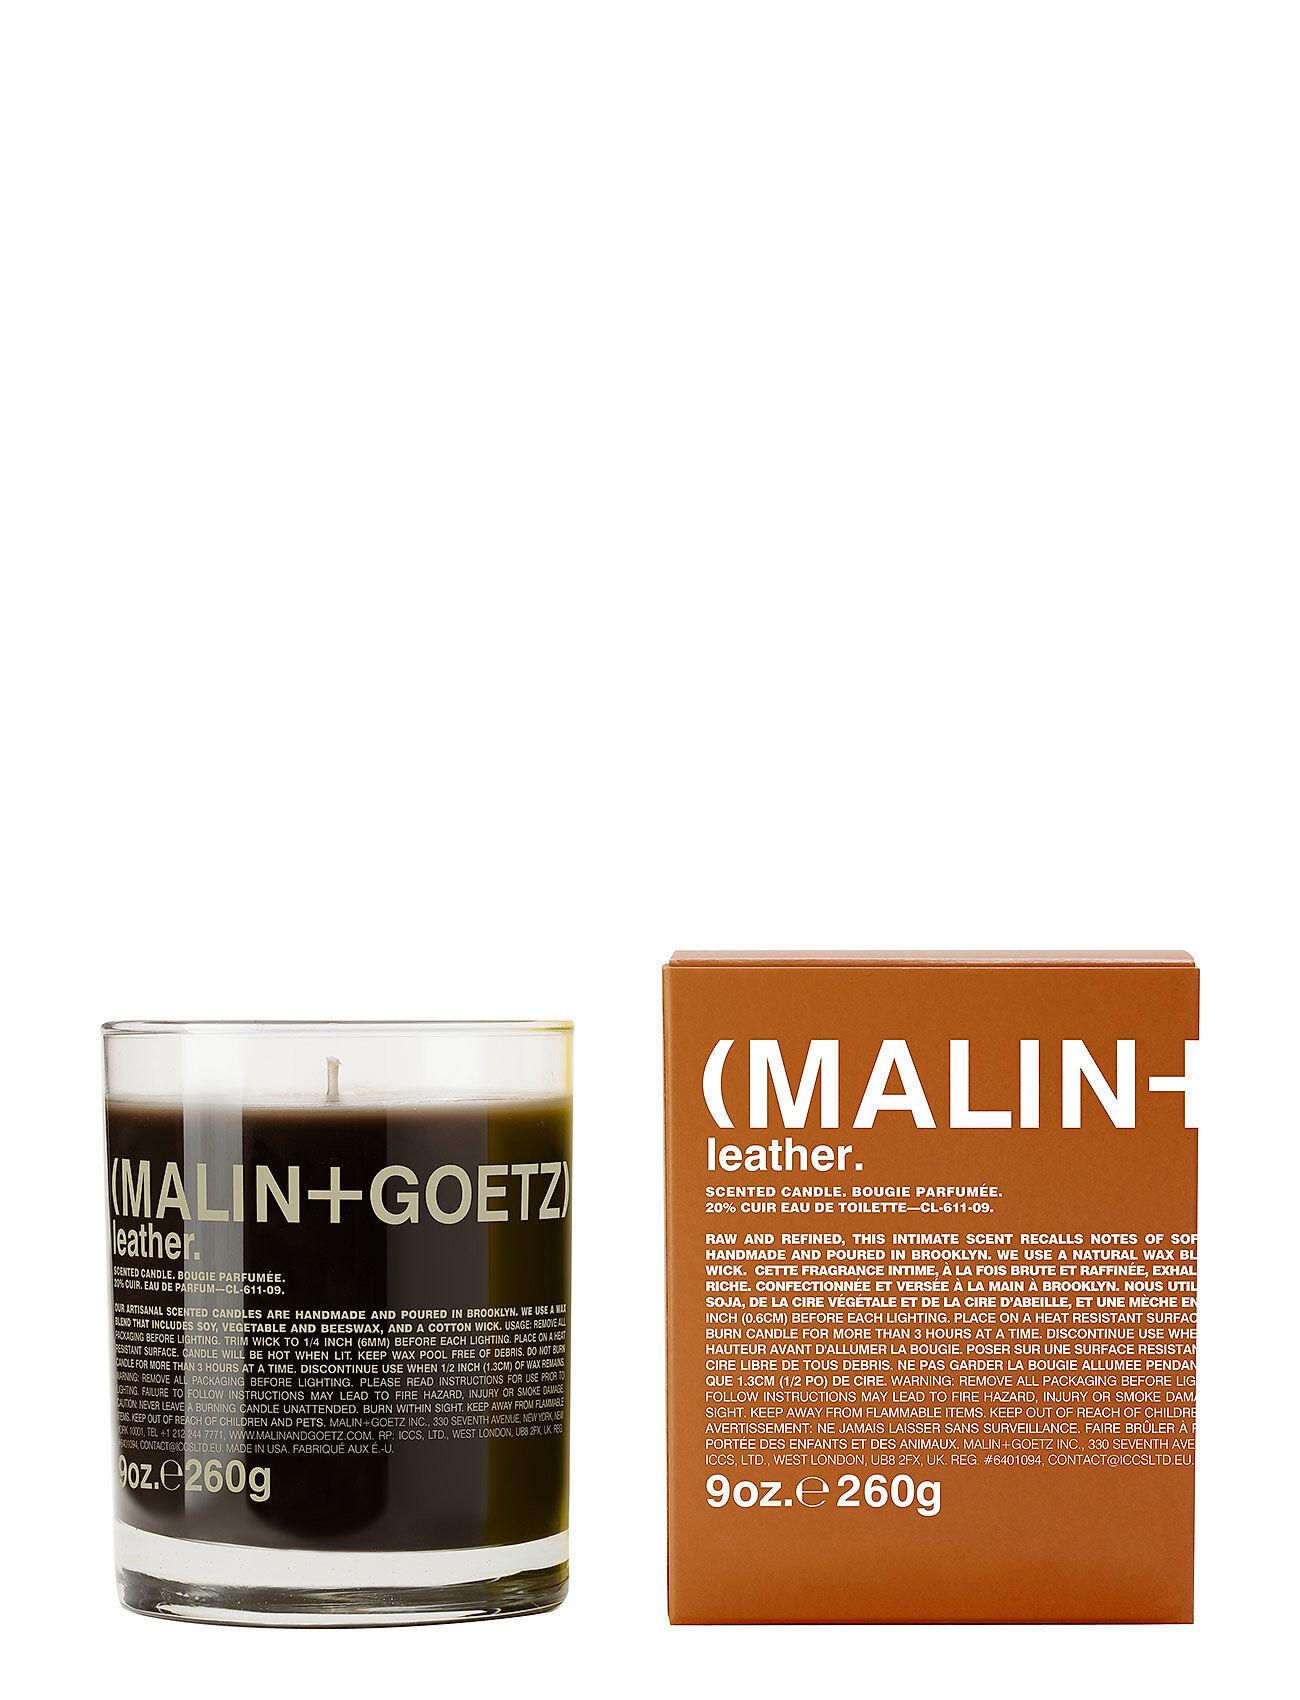 MALIN+GOETZ Leather Candle Hajuvesi Parfyymi Nude MALIN+GOETZ